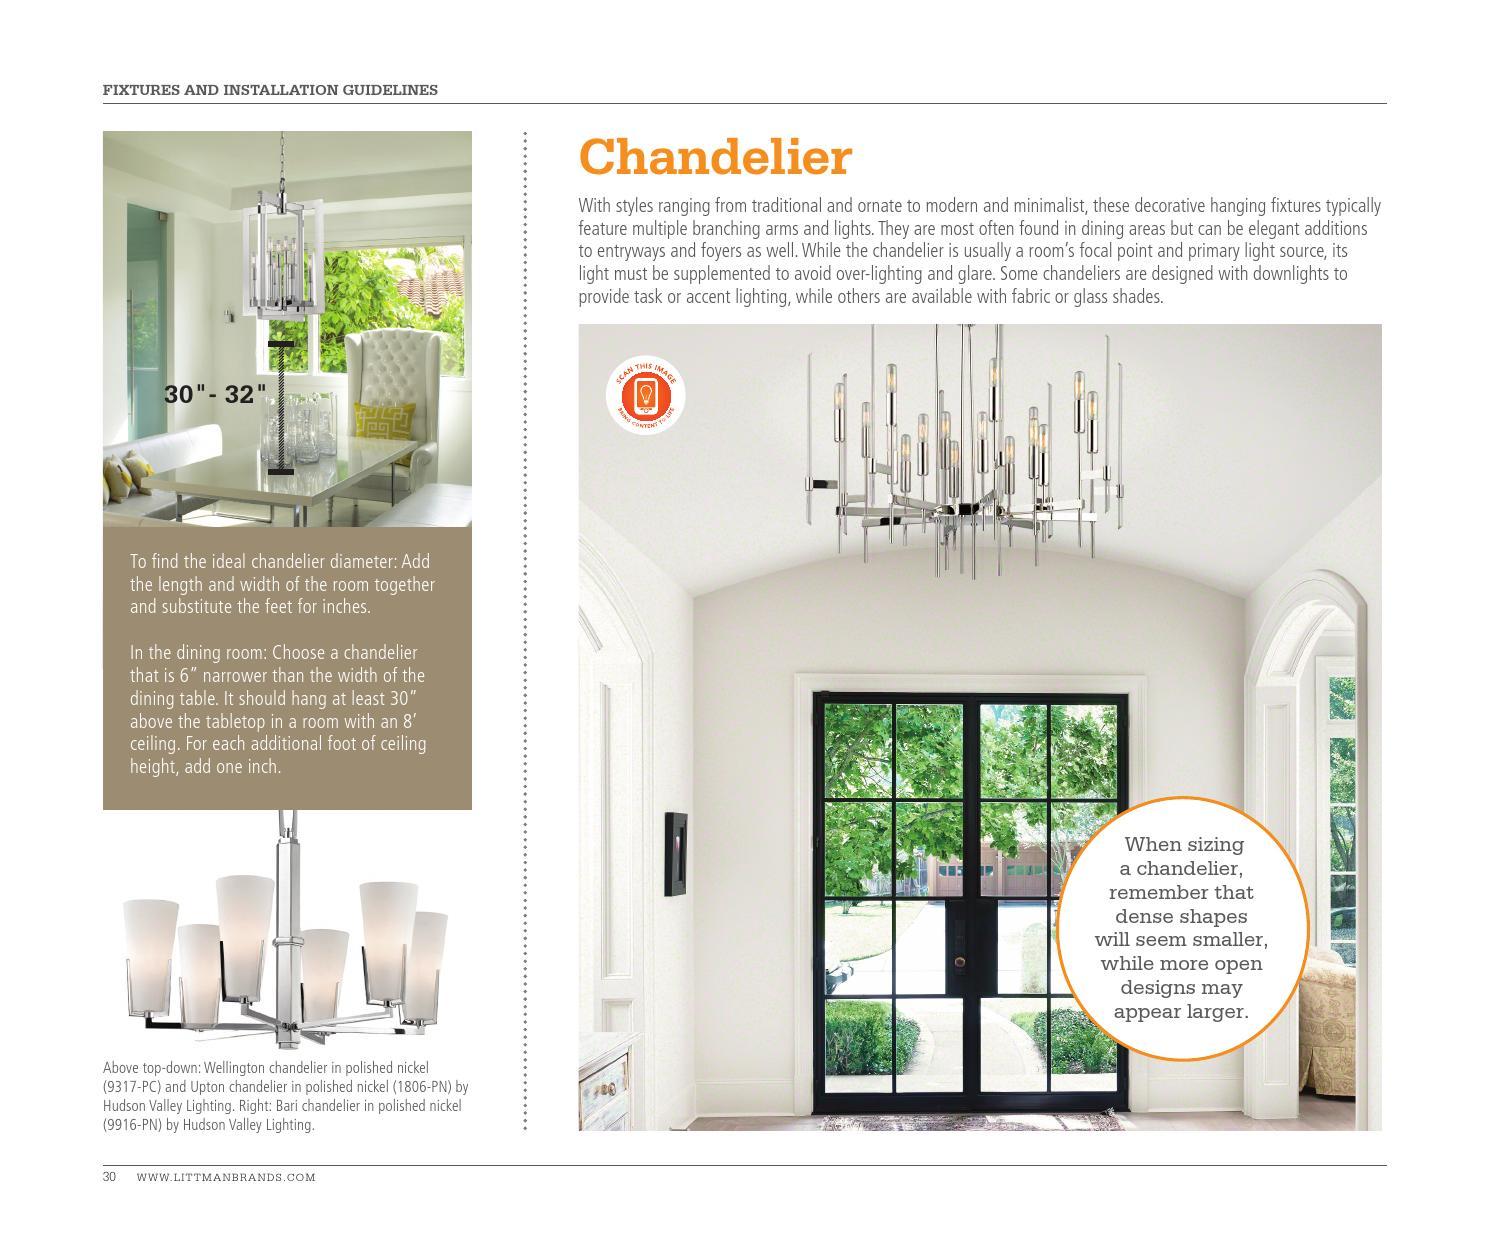 The lighting lookbook 2016 chandeliers by littman brands issuu arubaitofo Images